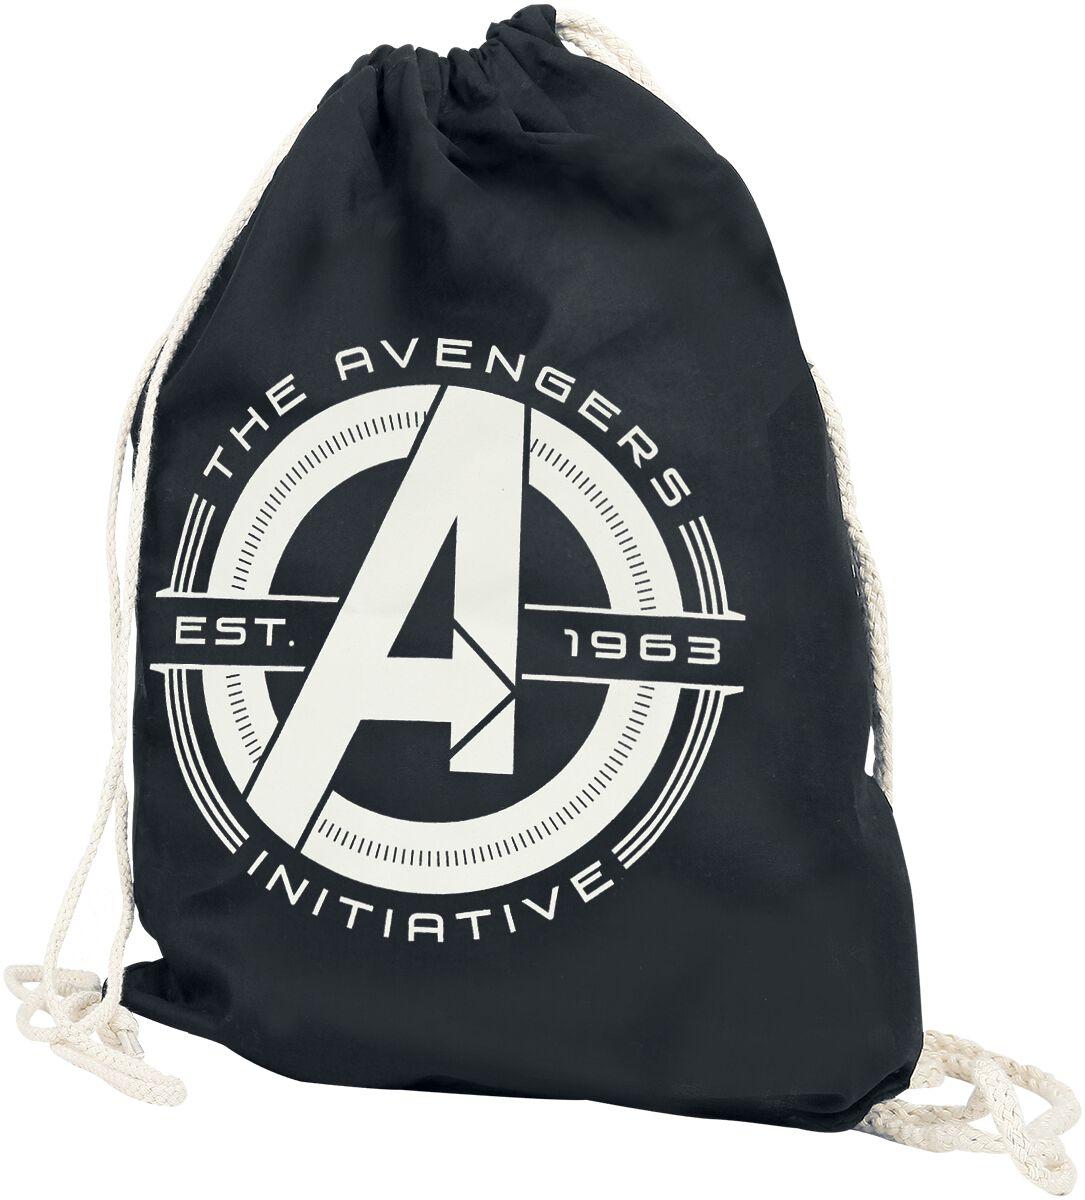 Sporttaschen - Avengers Initative Turnbeutel schwarz  - Onlineshop EMP